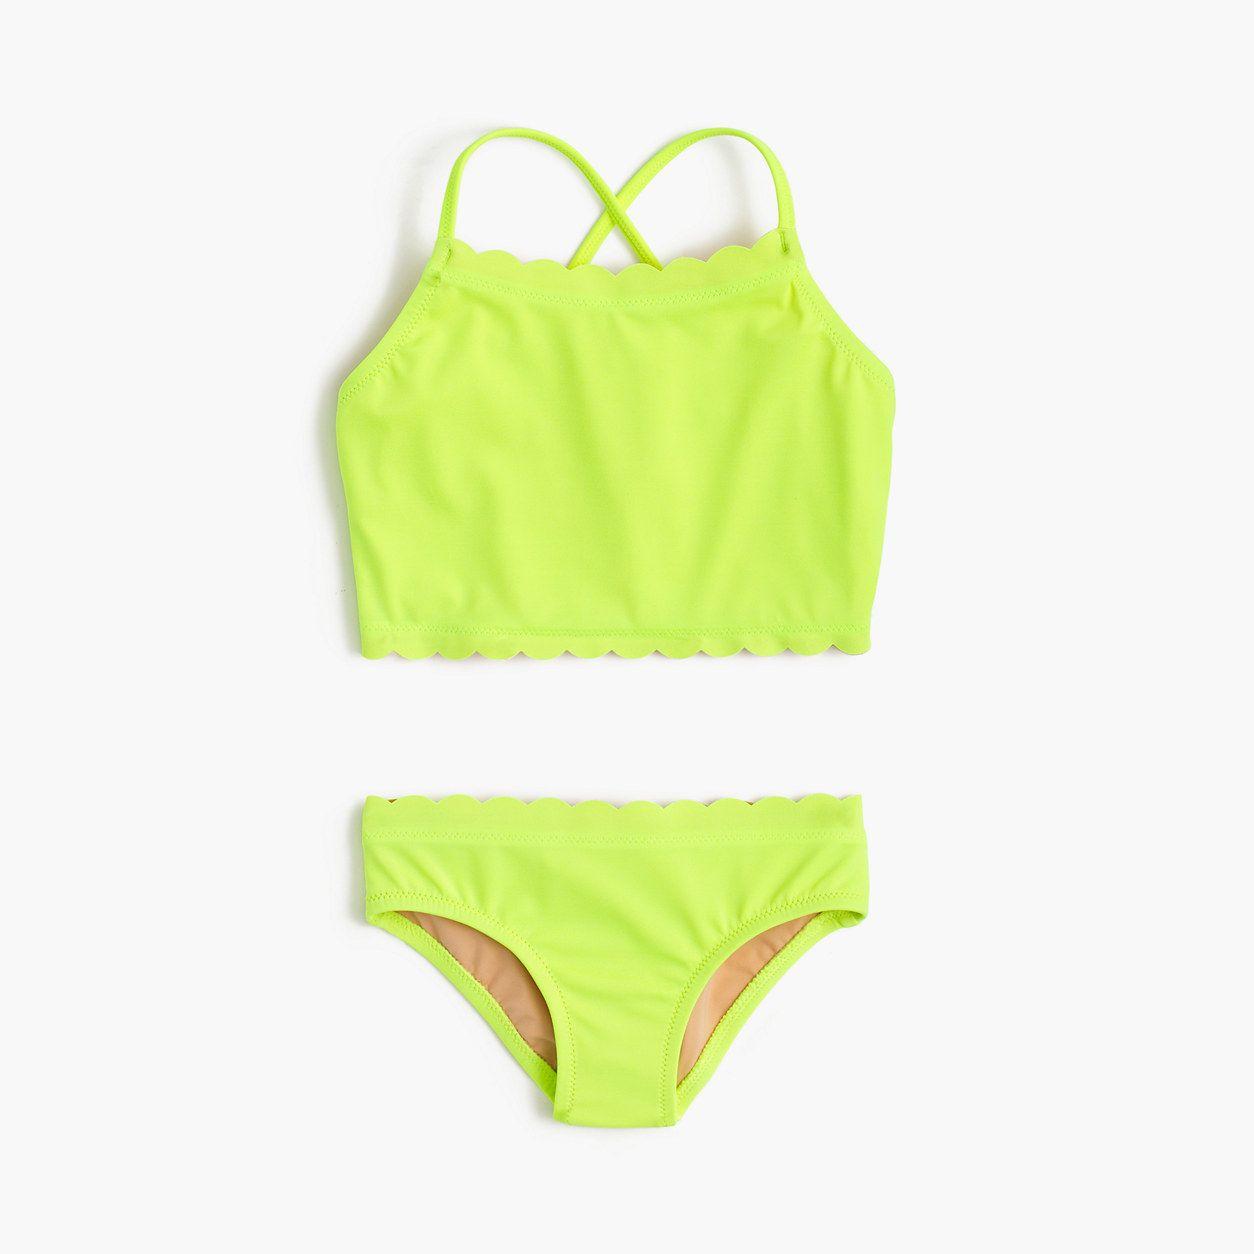 0dee0f4016c43 crewcuts Girls Scalloped Cropped Tankini Set In Neon (Size ...